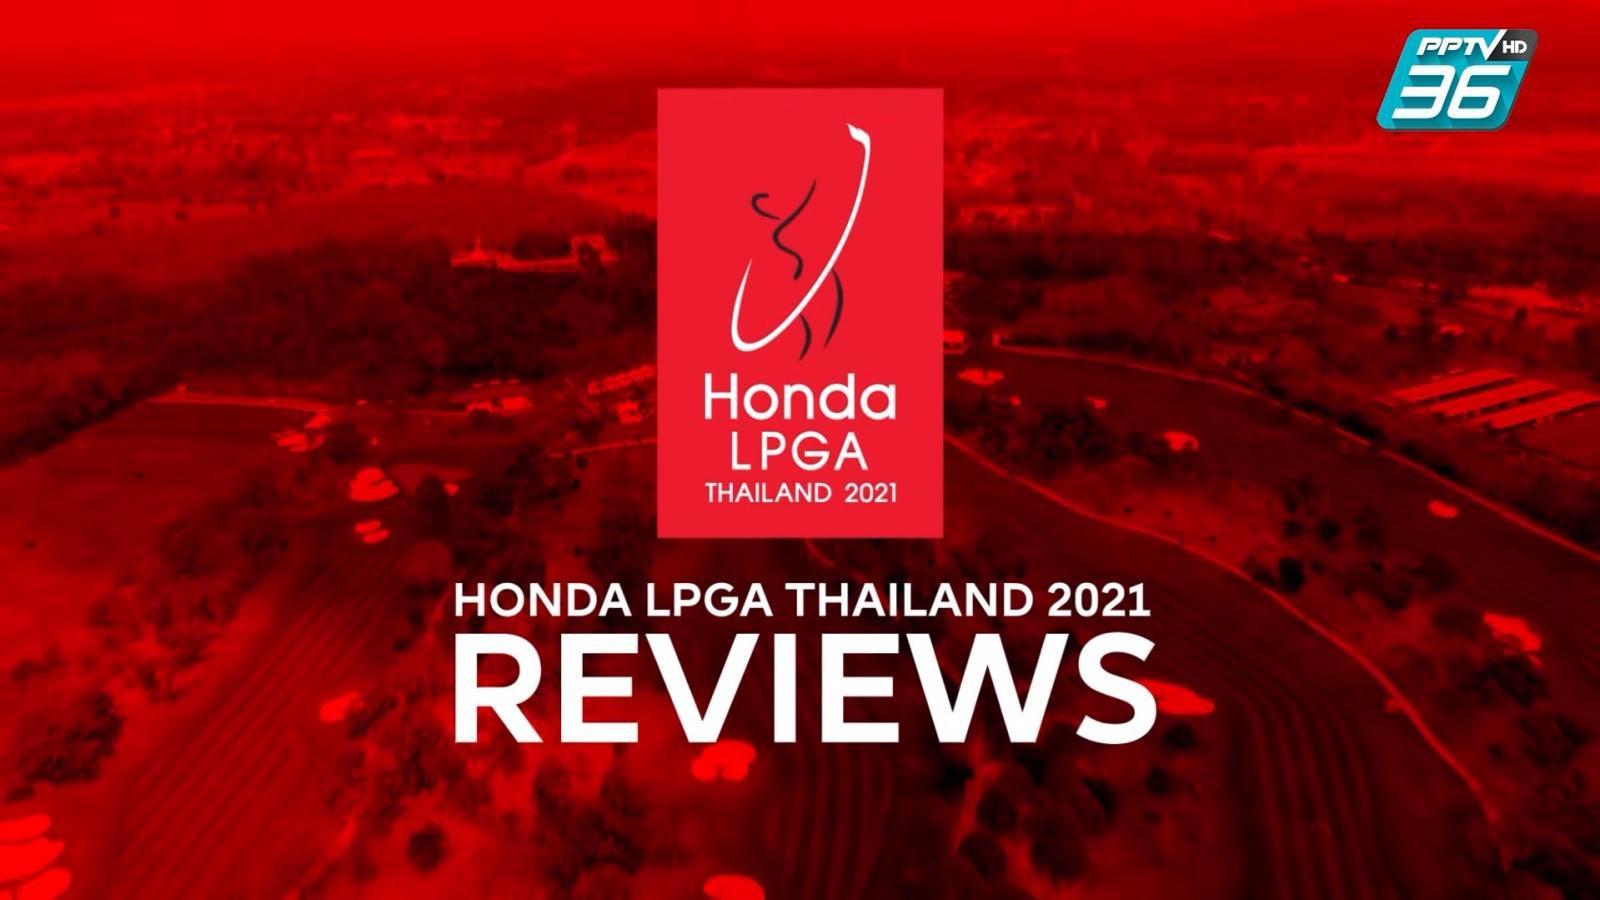 Honda LPGA Thailand 2021 Reviews : ตอนที่ 1